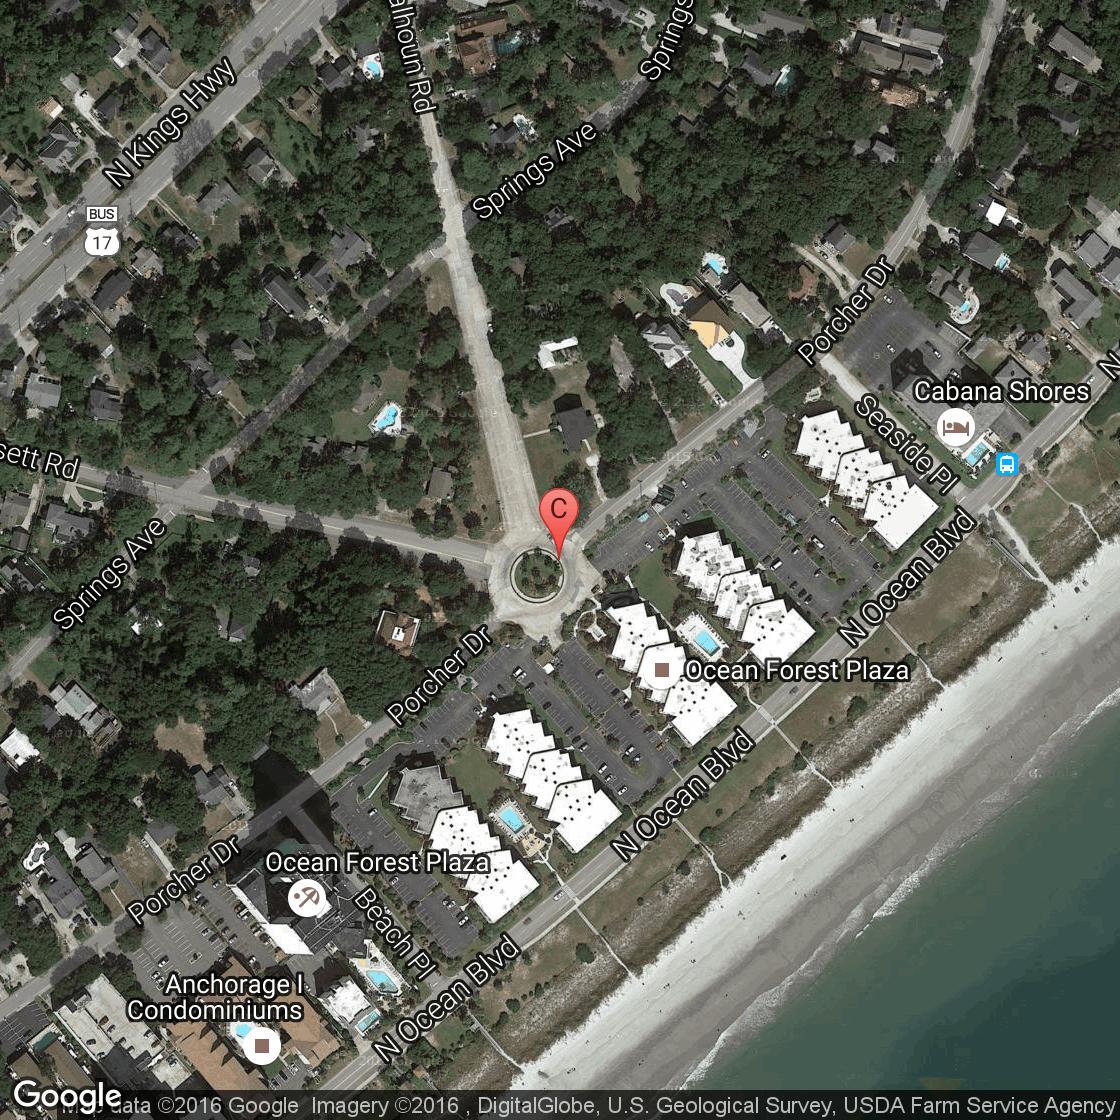 Pan american hotel wildwood crest nj - Hotels Near The Oceanic Hotel In Wildwood New Jersey